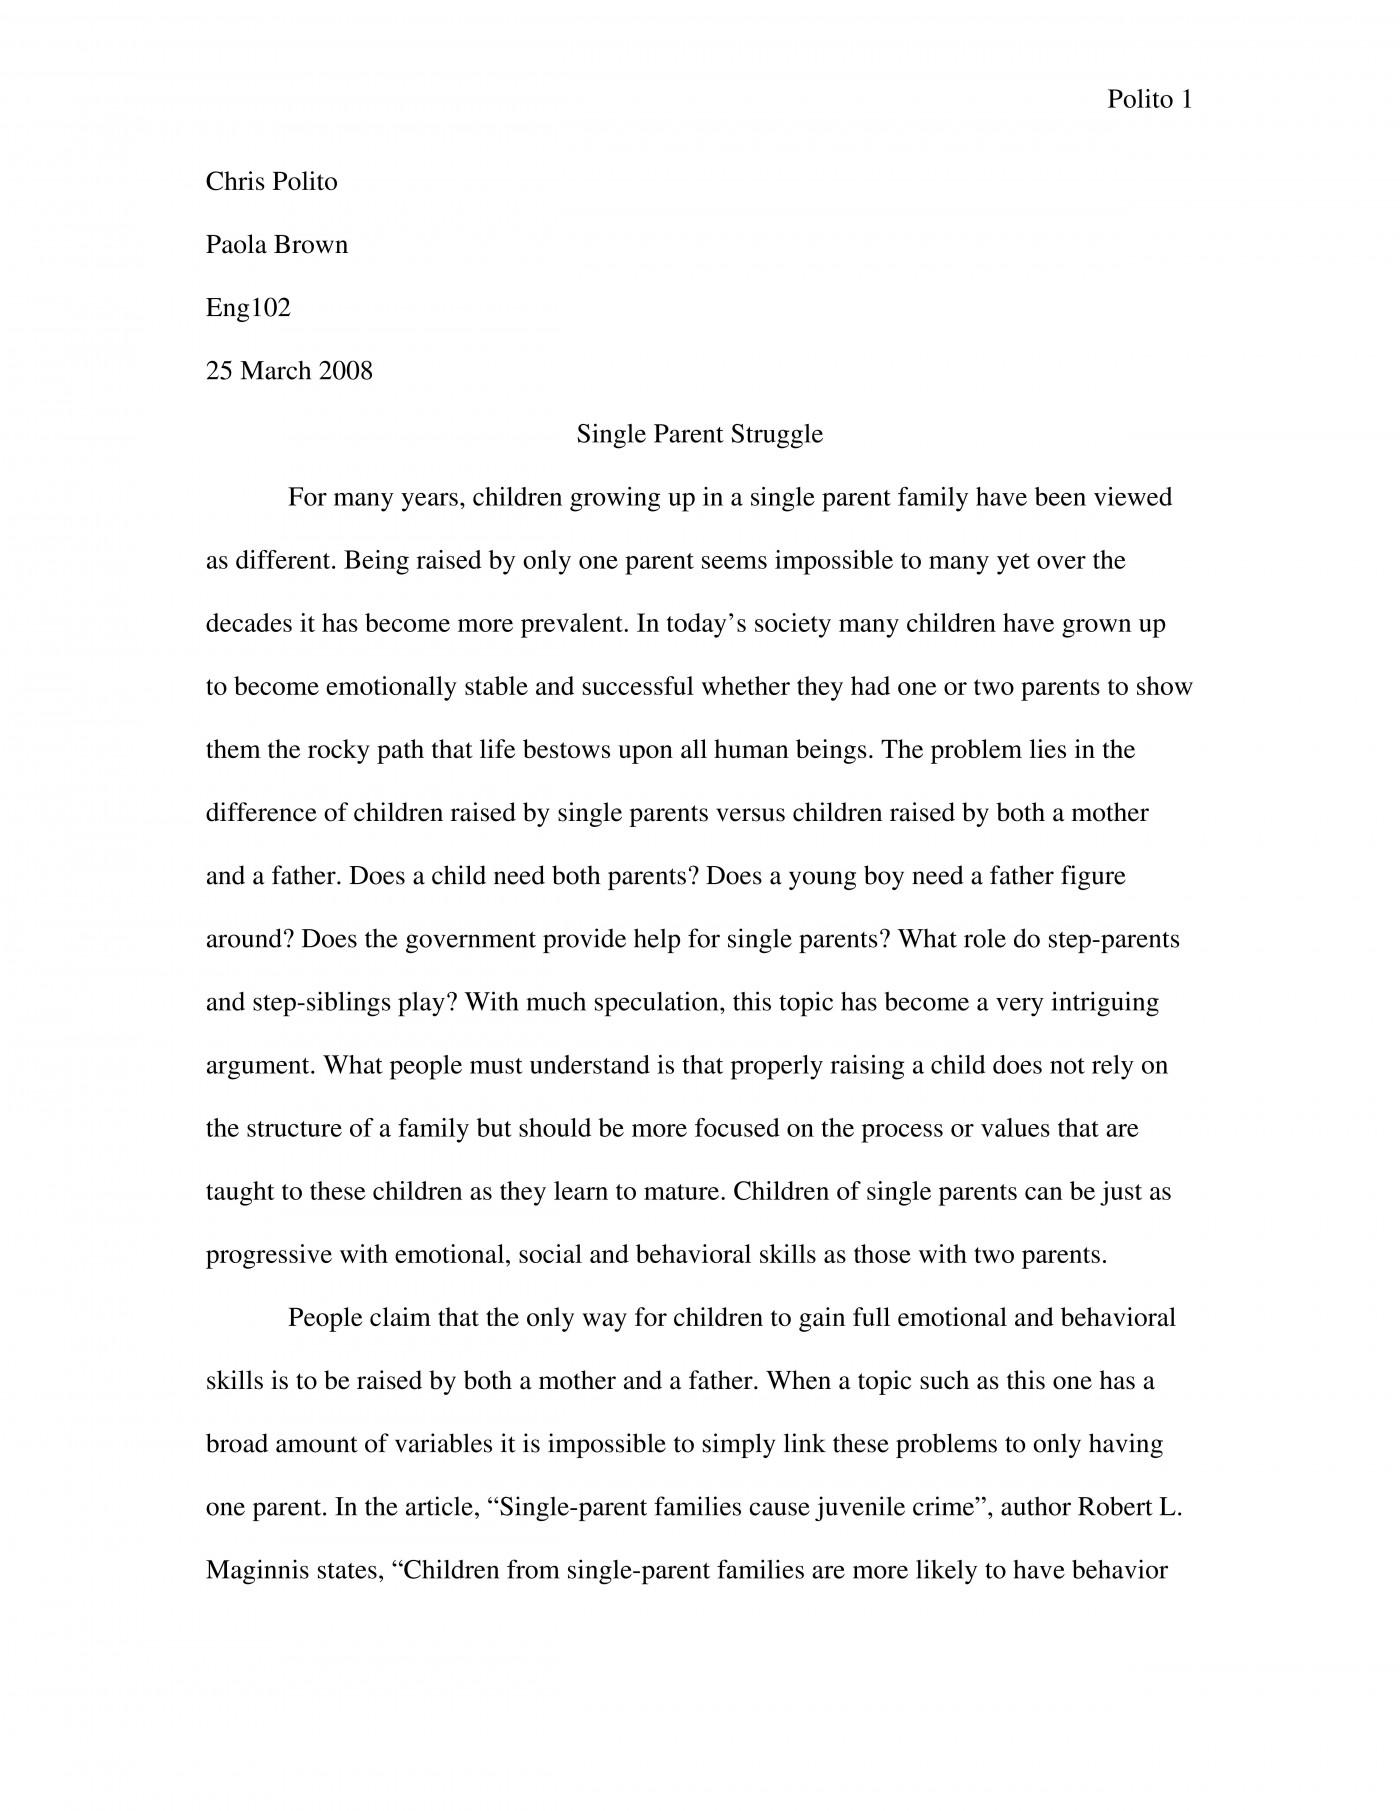 003 Rhetorical Essay Examples Example Unusual Analysis Ap Lang Mode Ethos Pathos Logos 1400